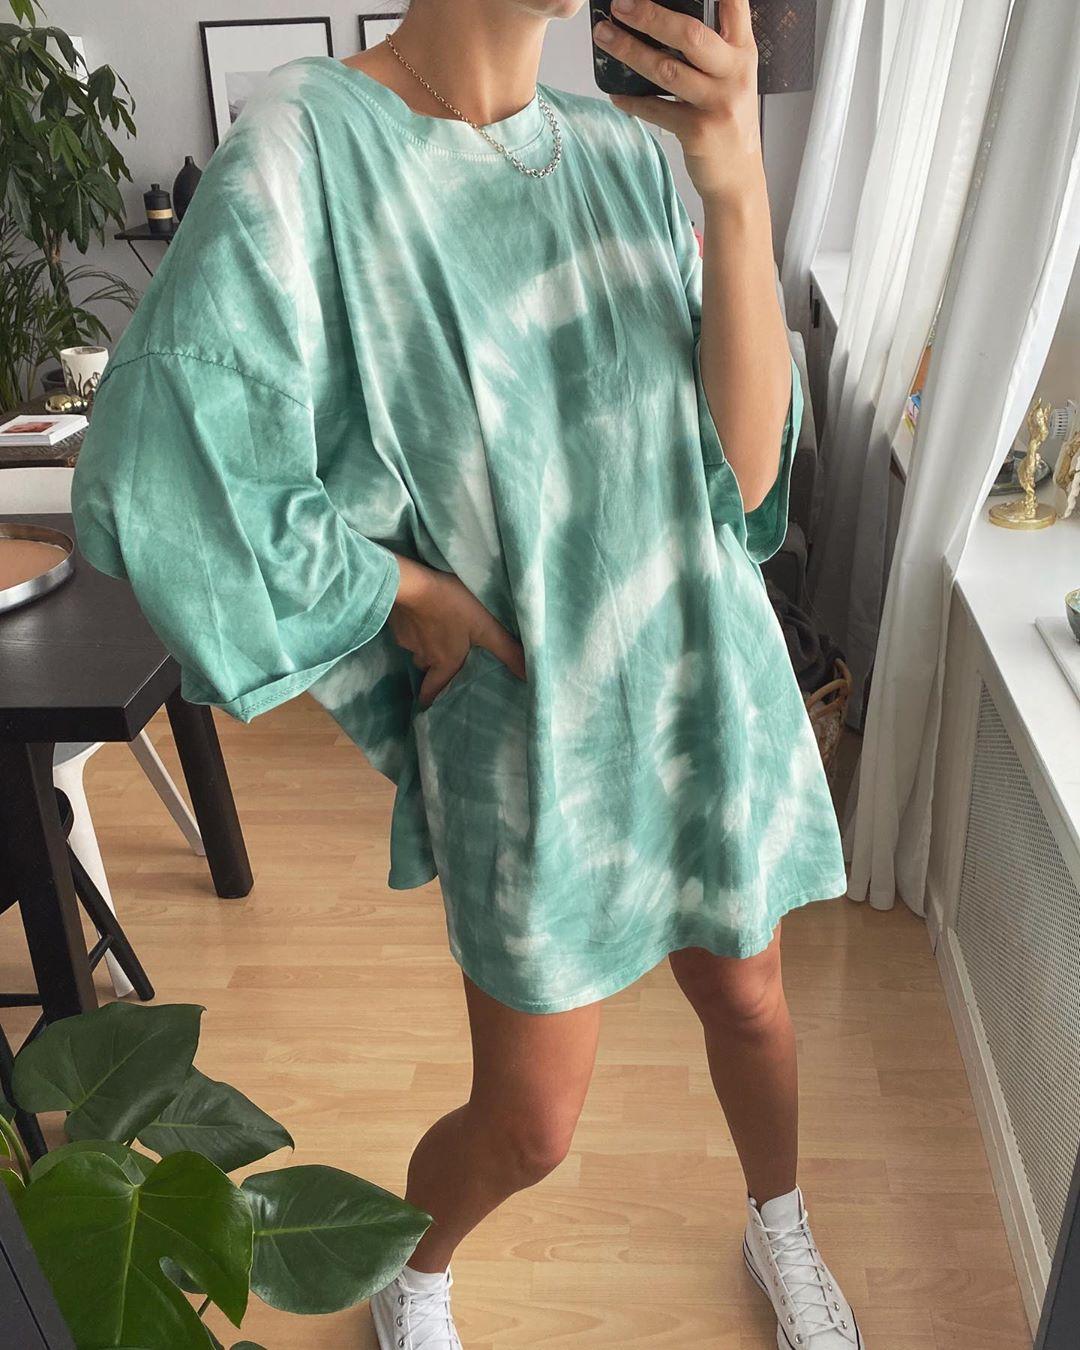 tee-shirt robe lagon de Les Bourgeoises sur lesbourgeoisesofficiel